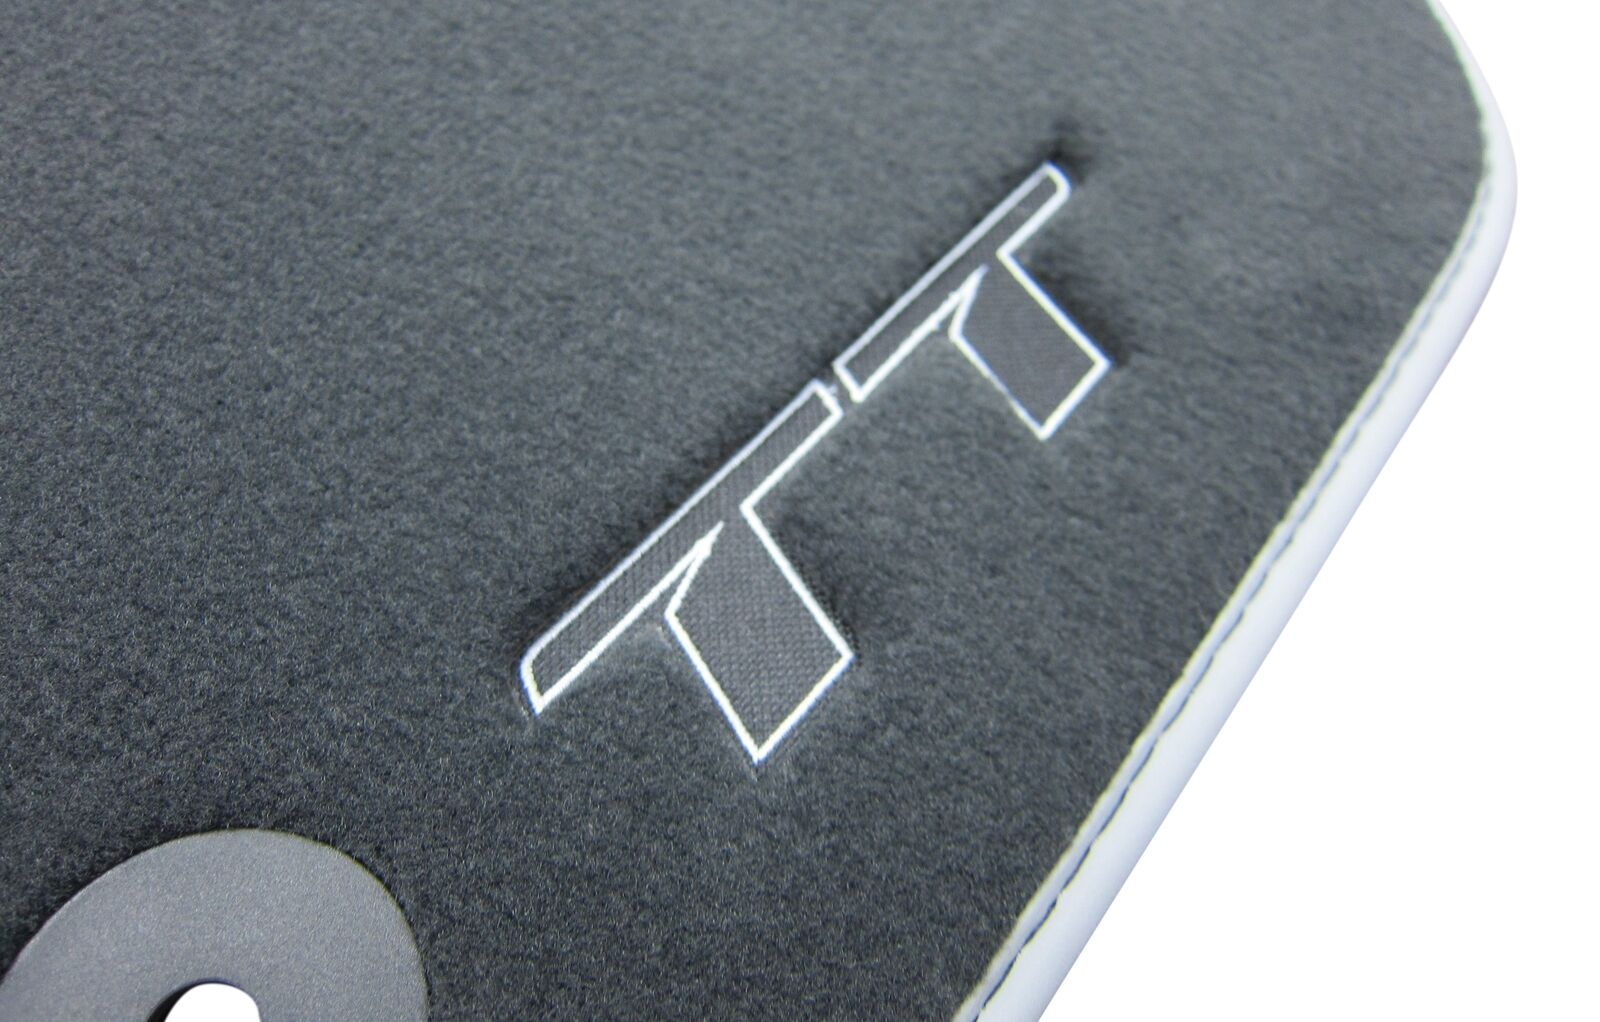 Audi TT 8J Velours Fußmatten Autoteppiche Bj2006/_2015 Sport Logo Neu*Premium *